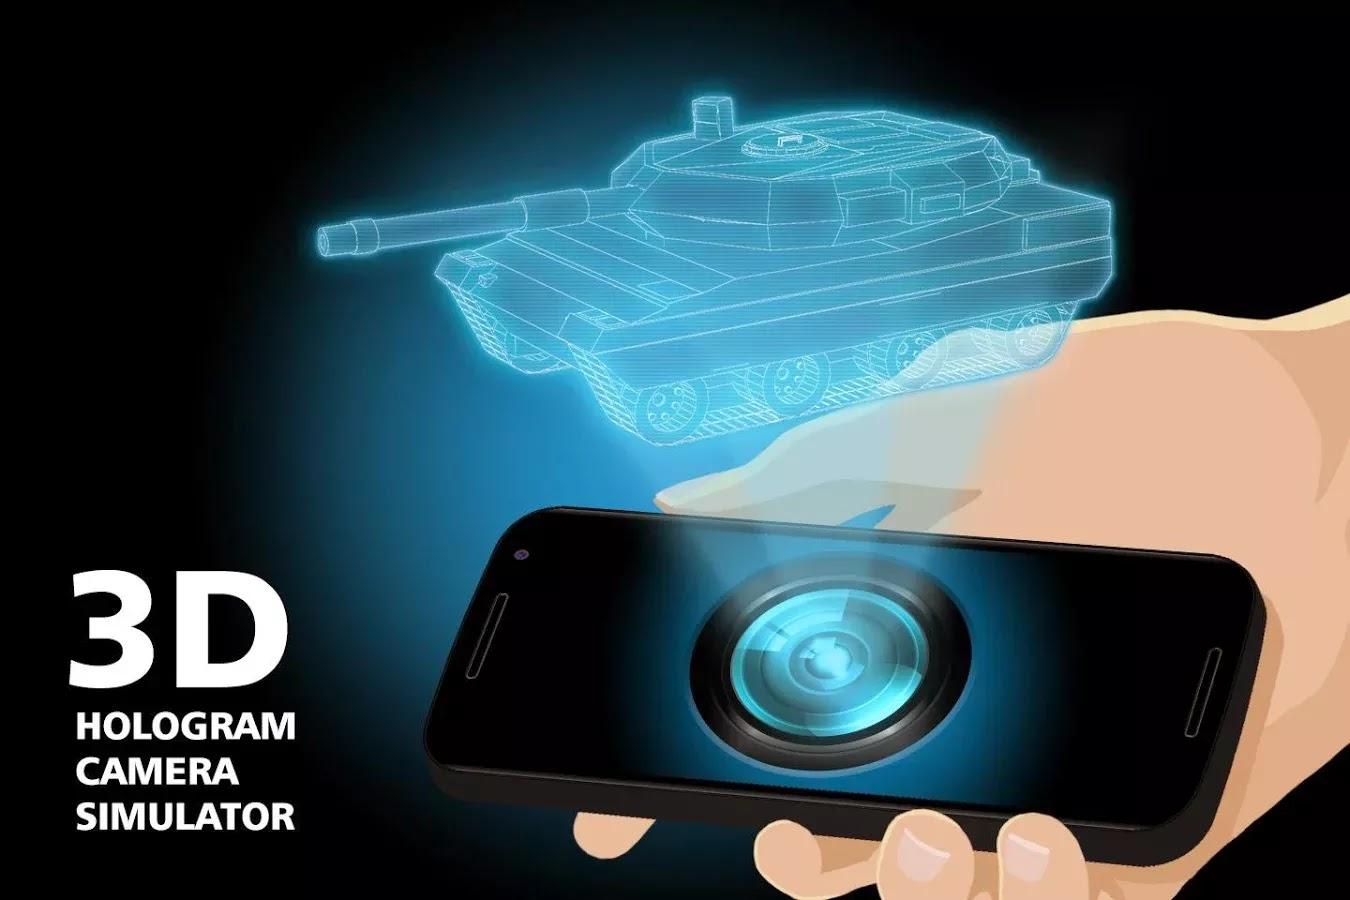 3d hologram camera simulator | Download APK For Free